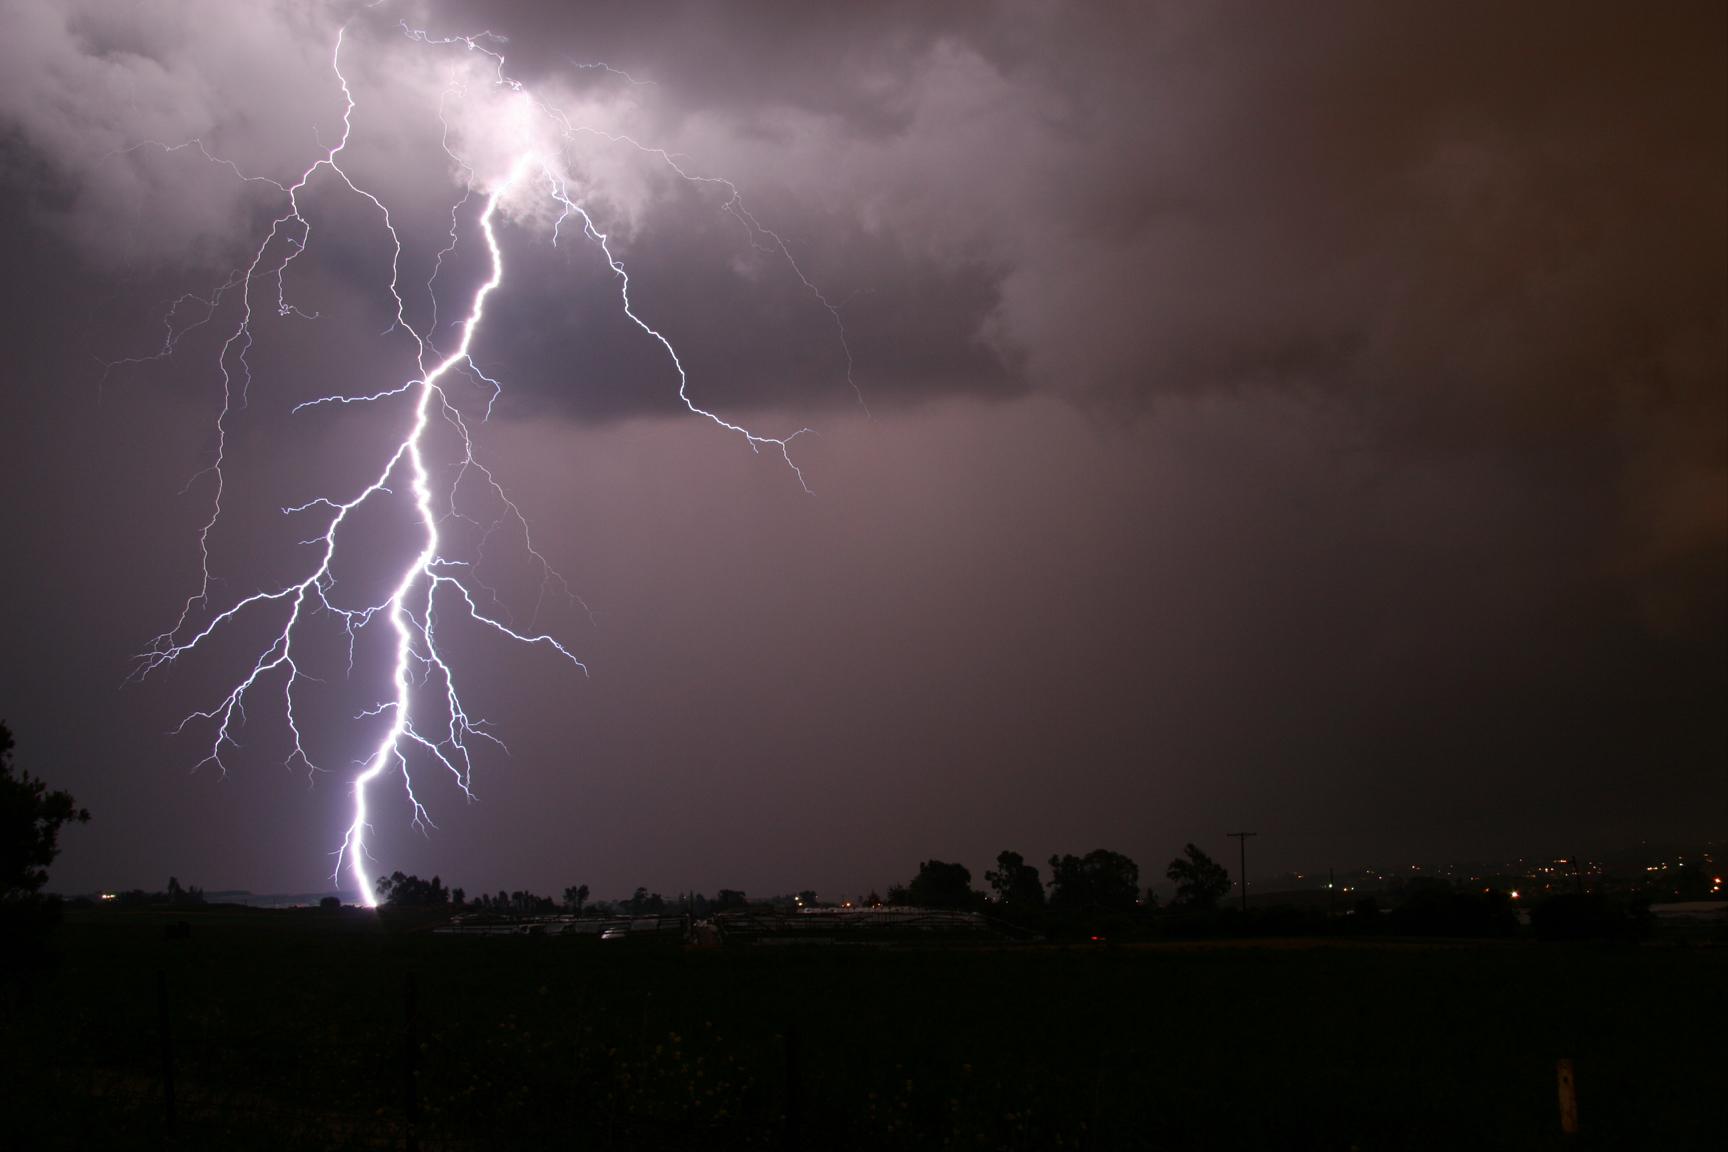 Lightning storm rain night clouds wallpaper | 1728x1152 ...